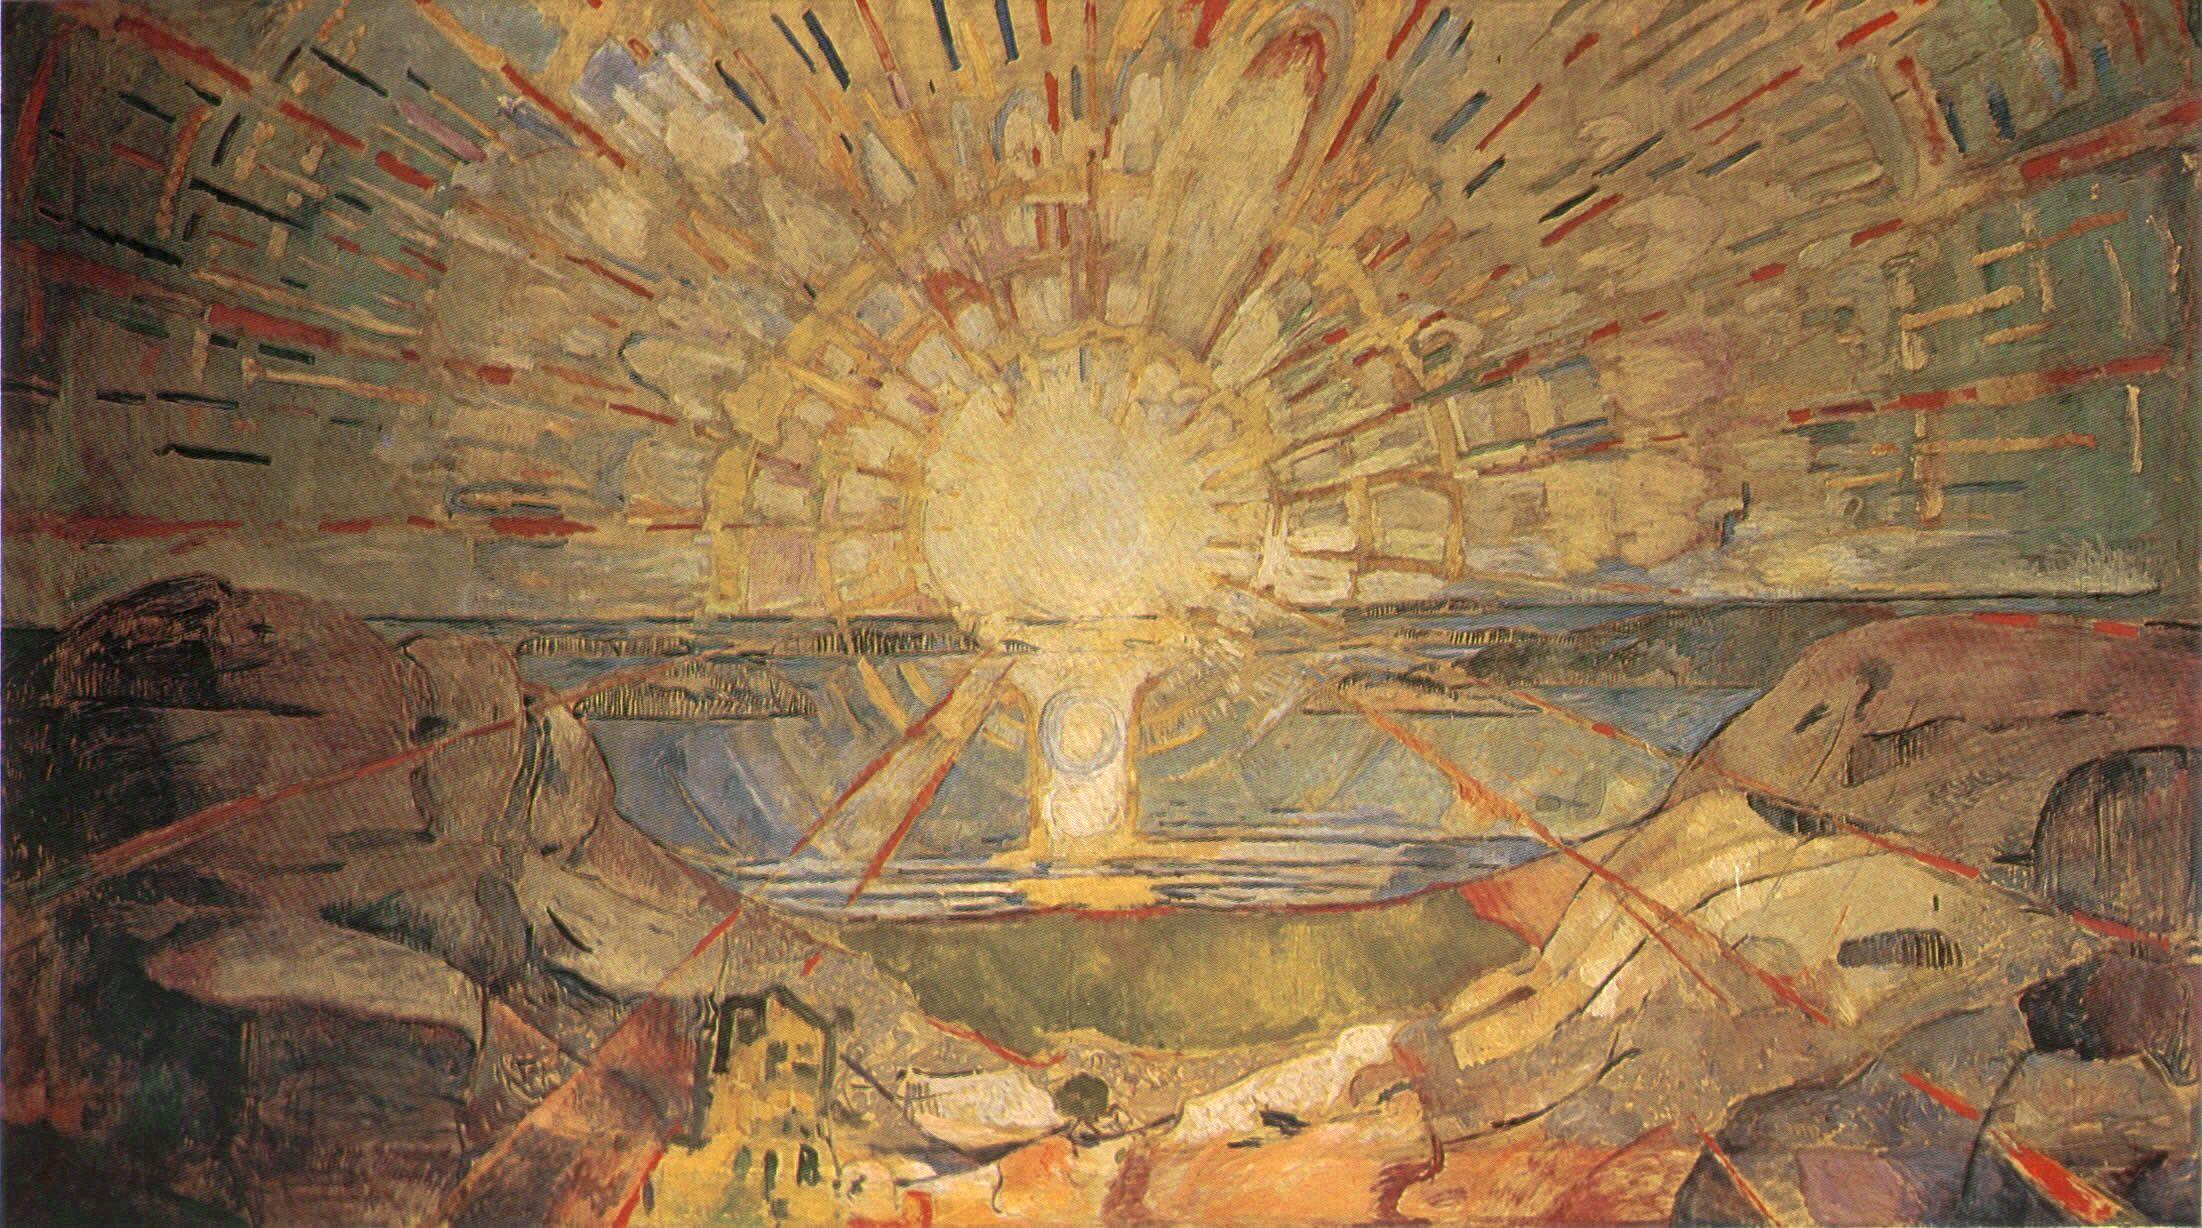 Edvard Munch The Sun Painting Edvard Munch Art